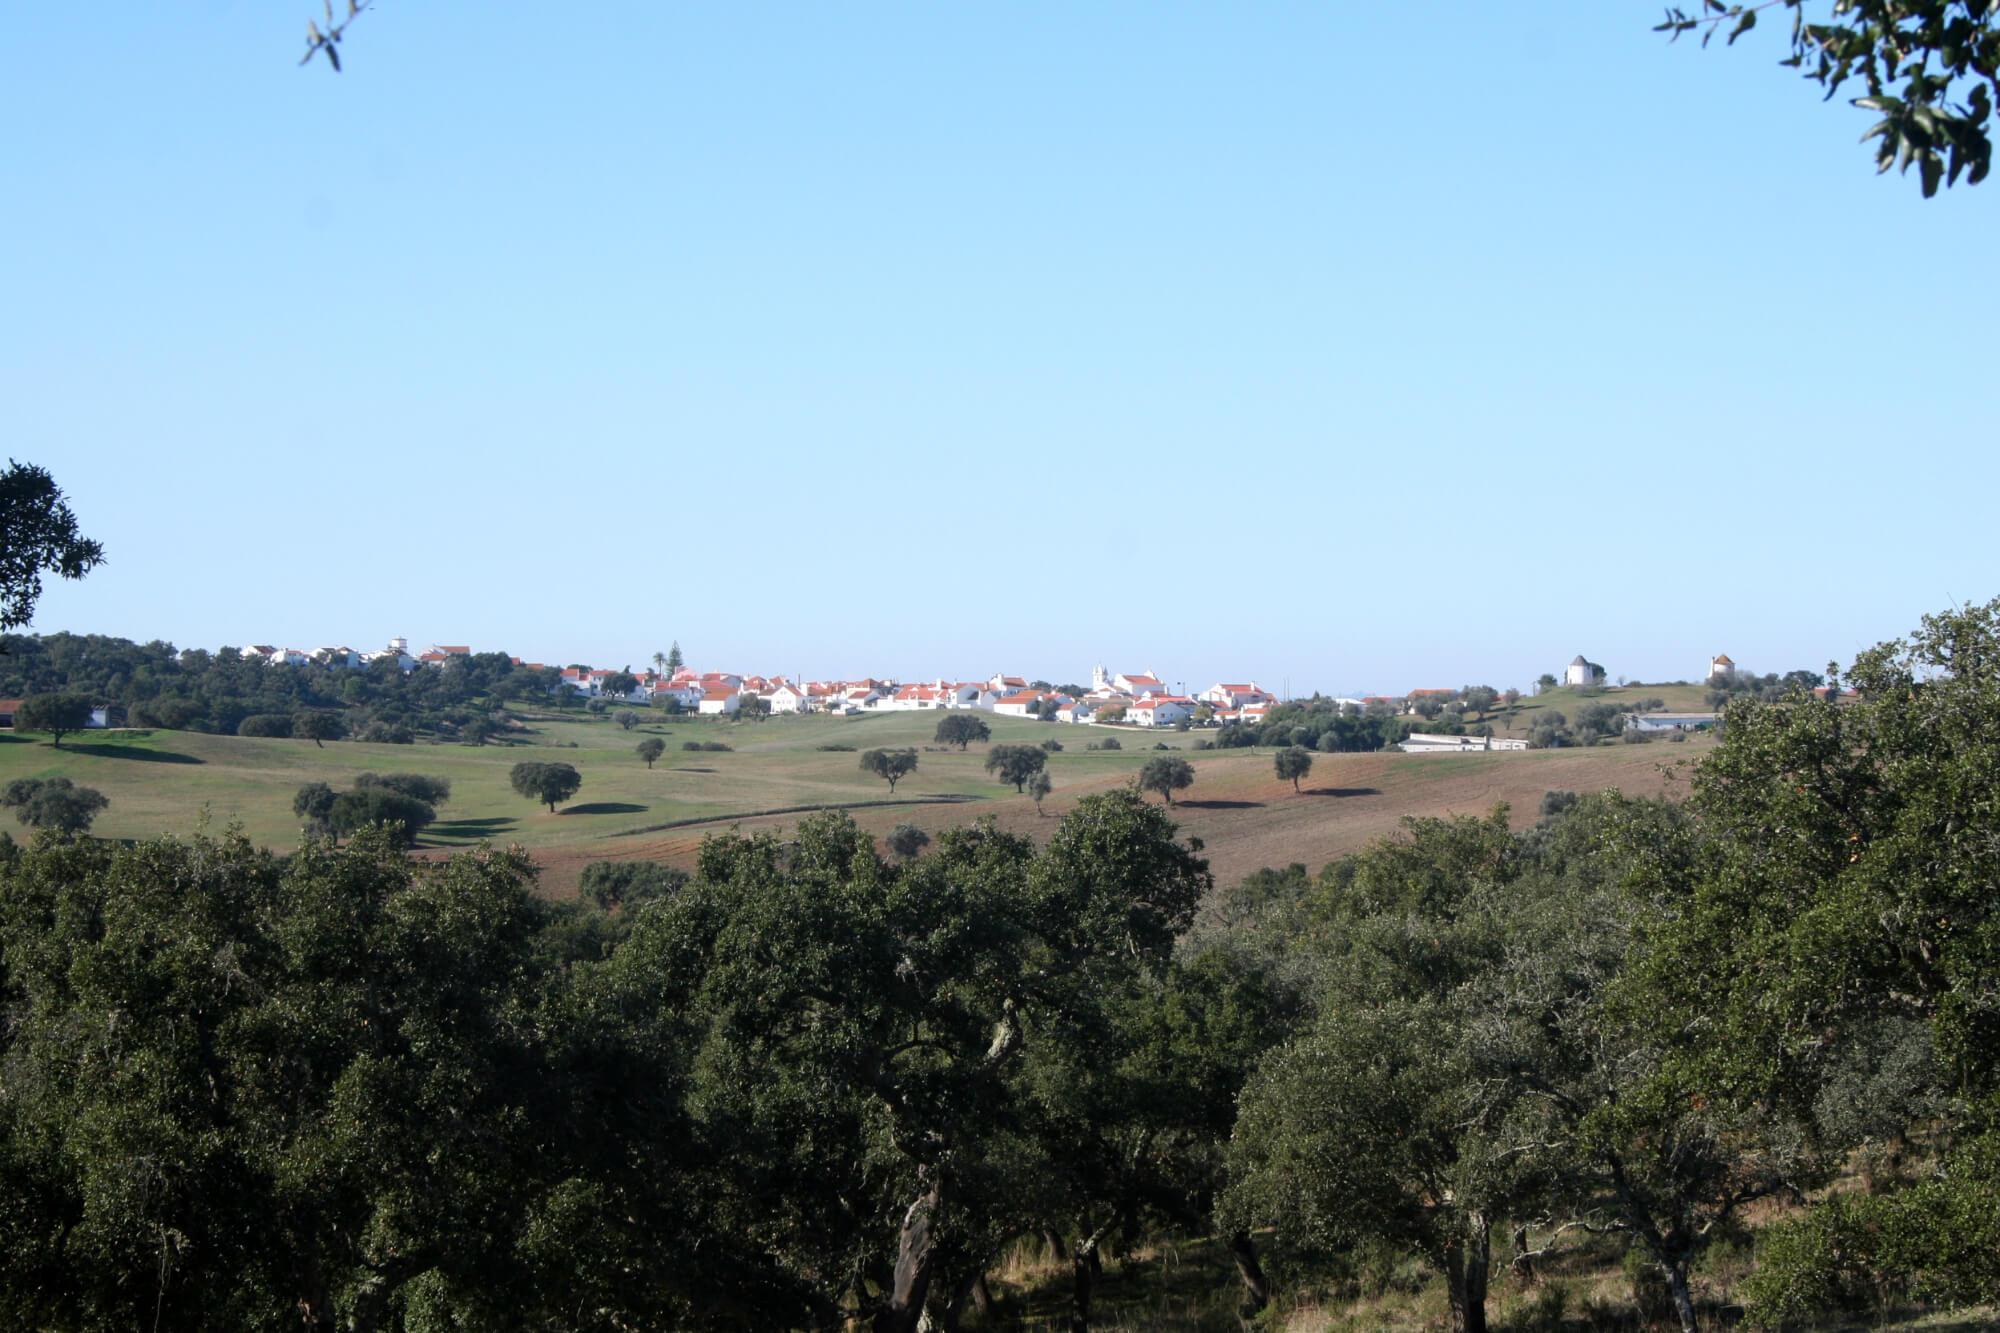 Vista Cabrela 03, 24.11.2007 (MJR)